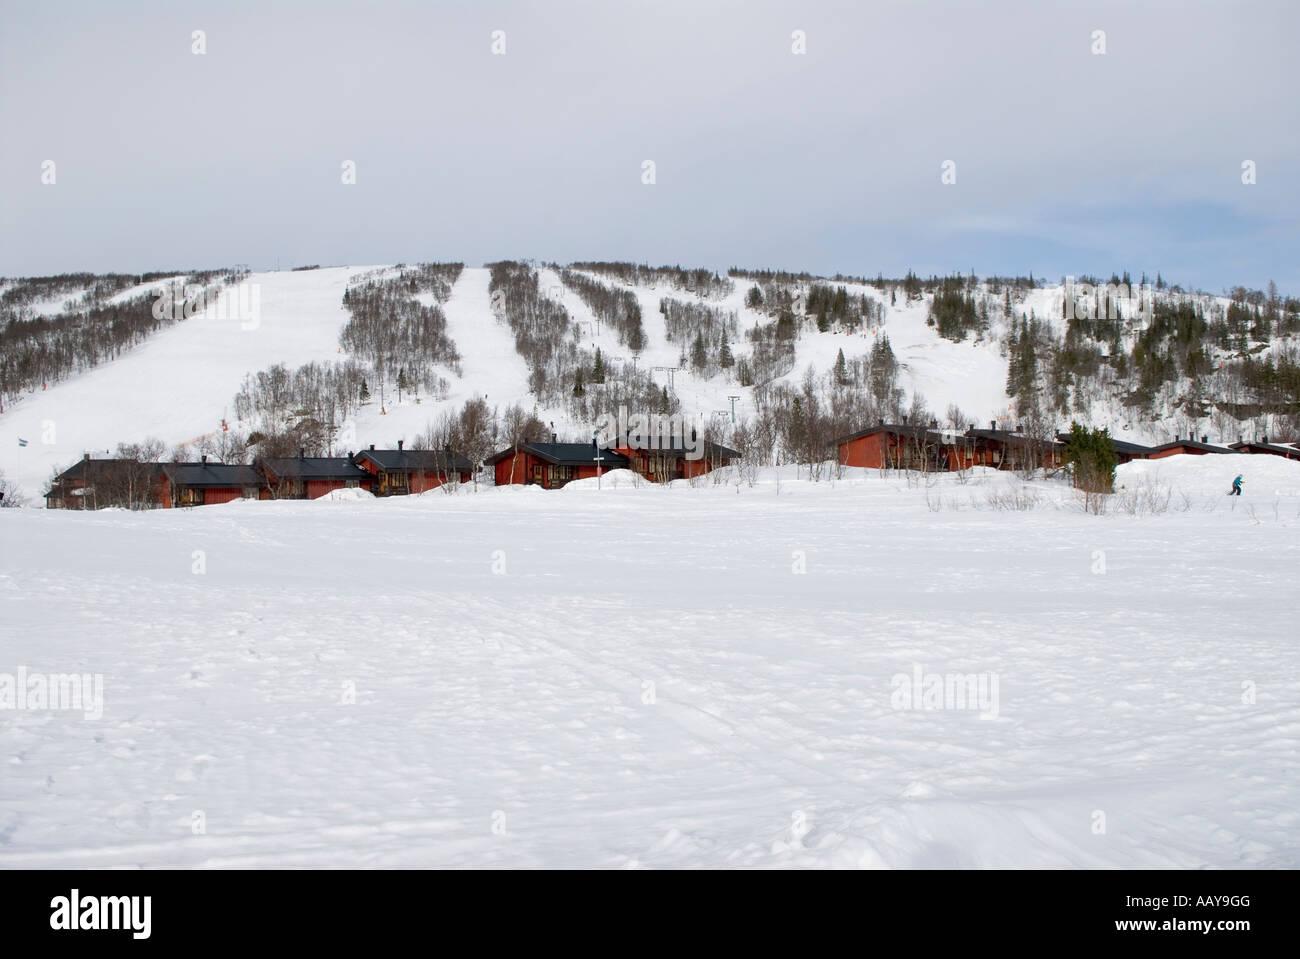 are skiresort sweden stock photos & are skiresort sweden stock